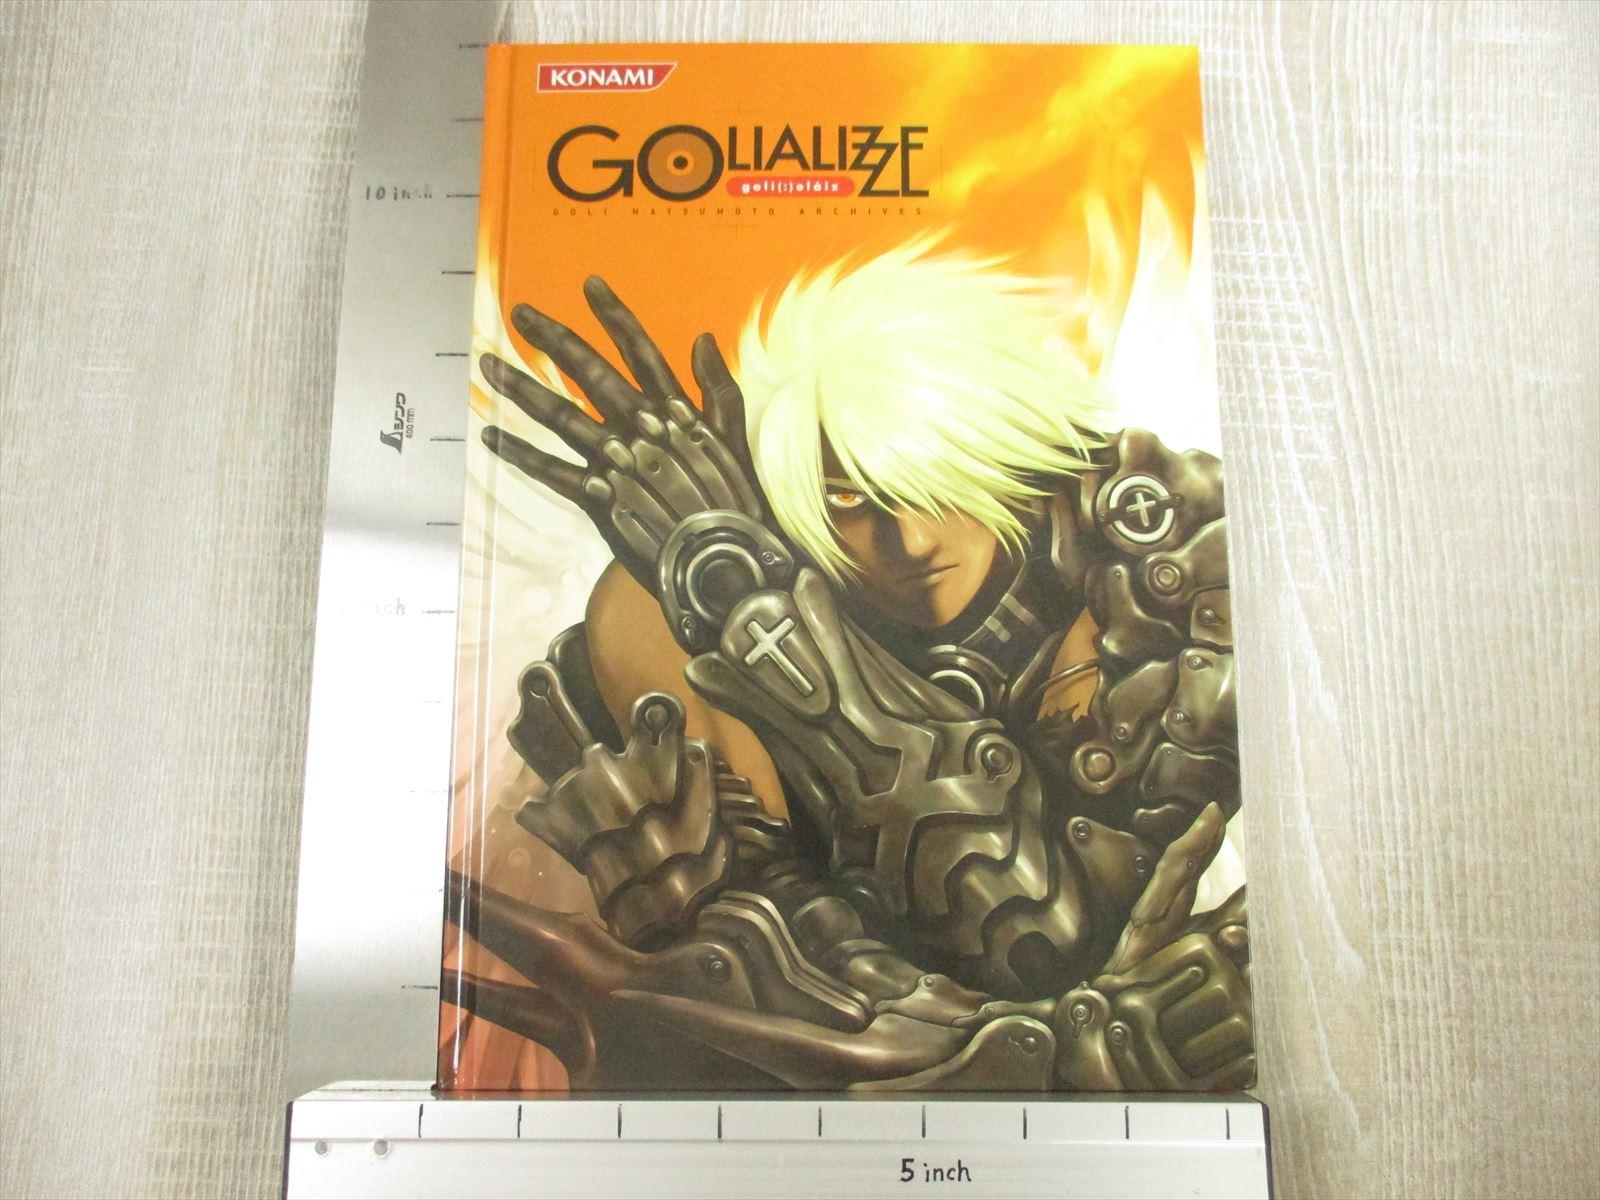 GOLI MATSUMOTO Archives GOLIALIZZE w//Posters Art Works Book KONAMI Ltd *